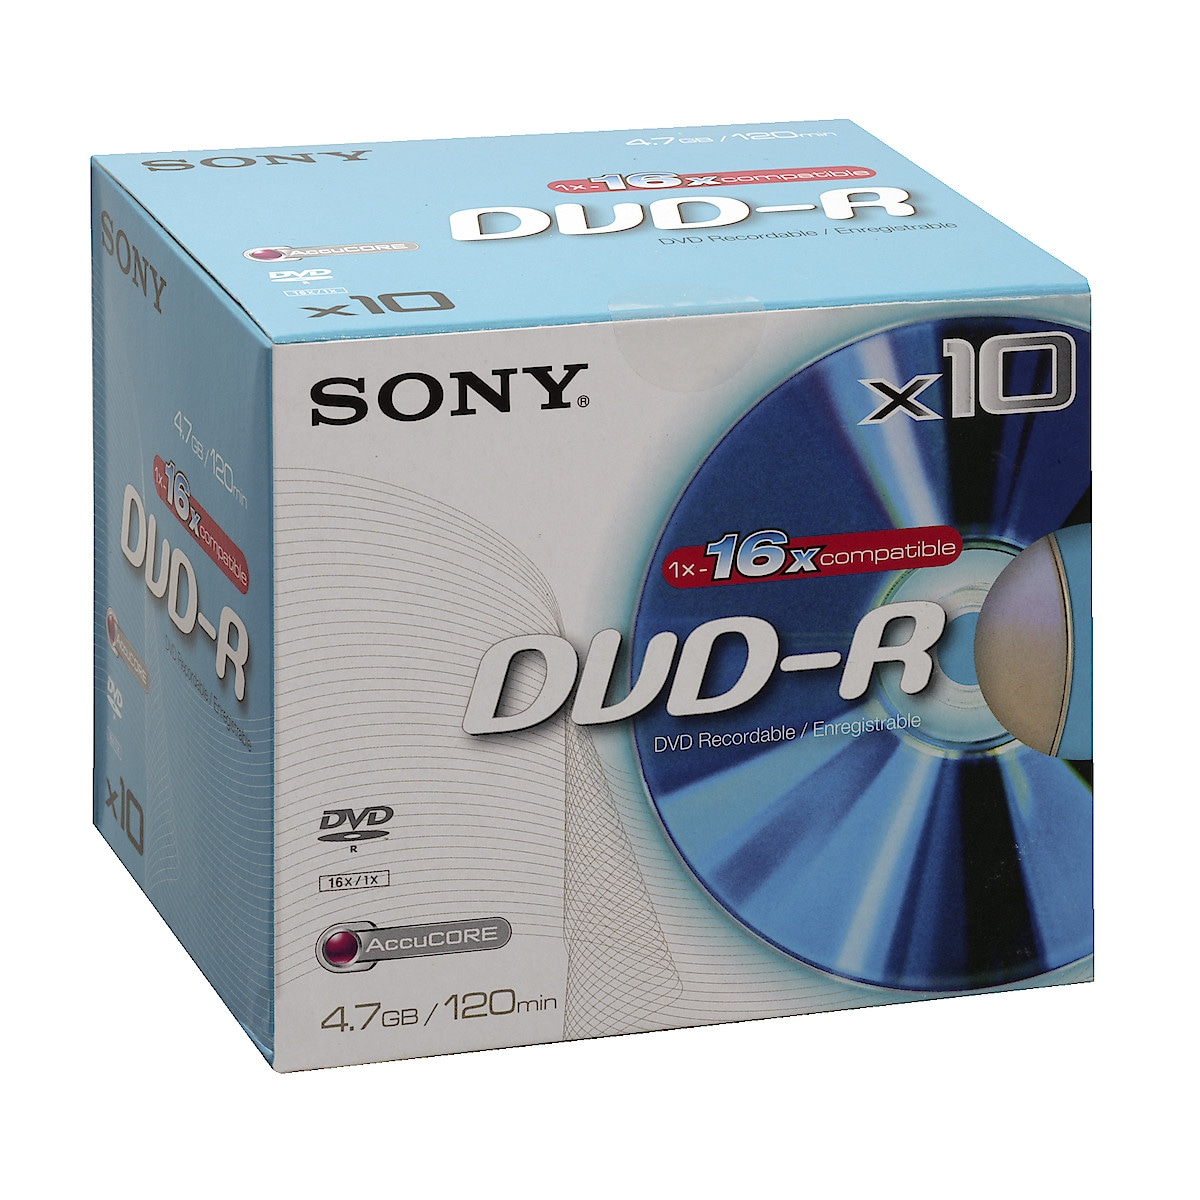 DVD R, 4.7 GB